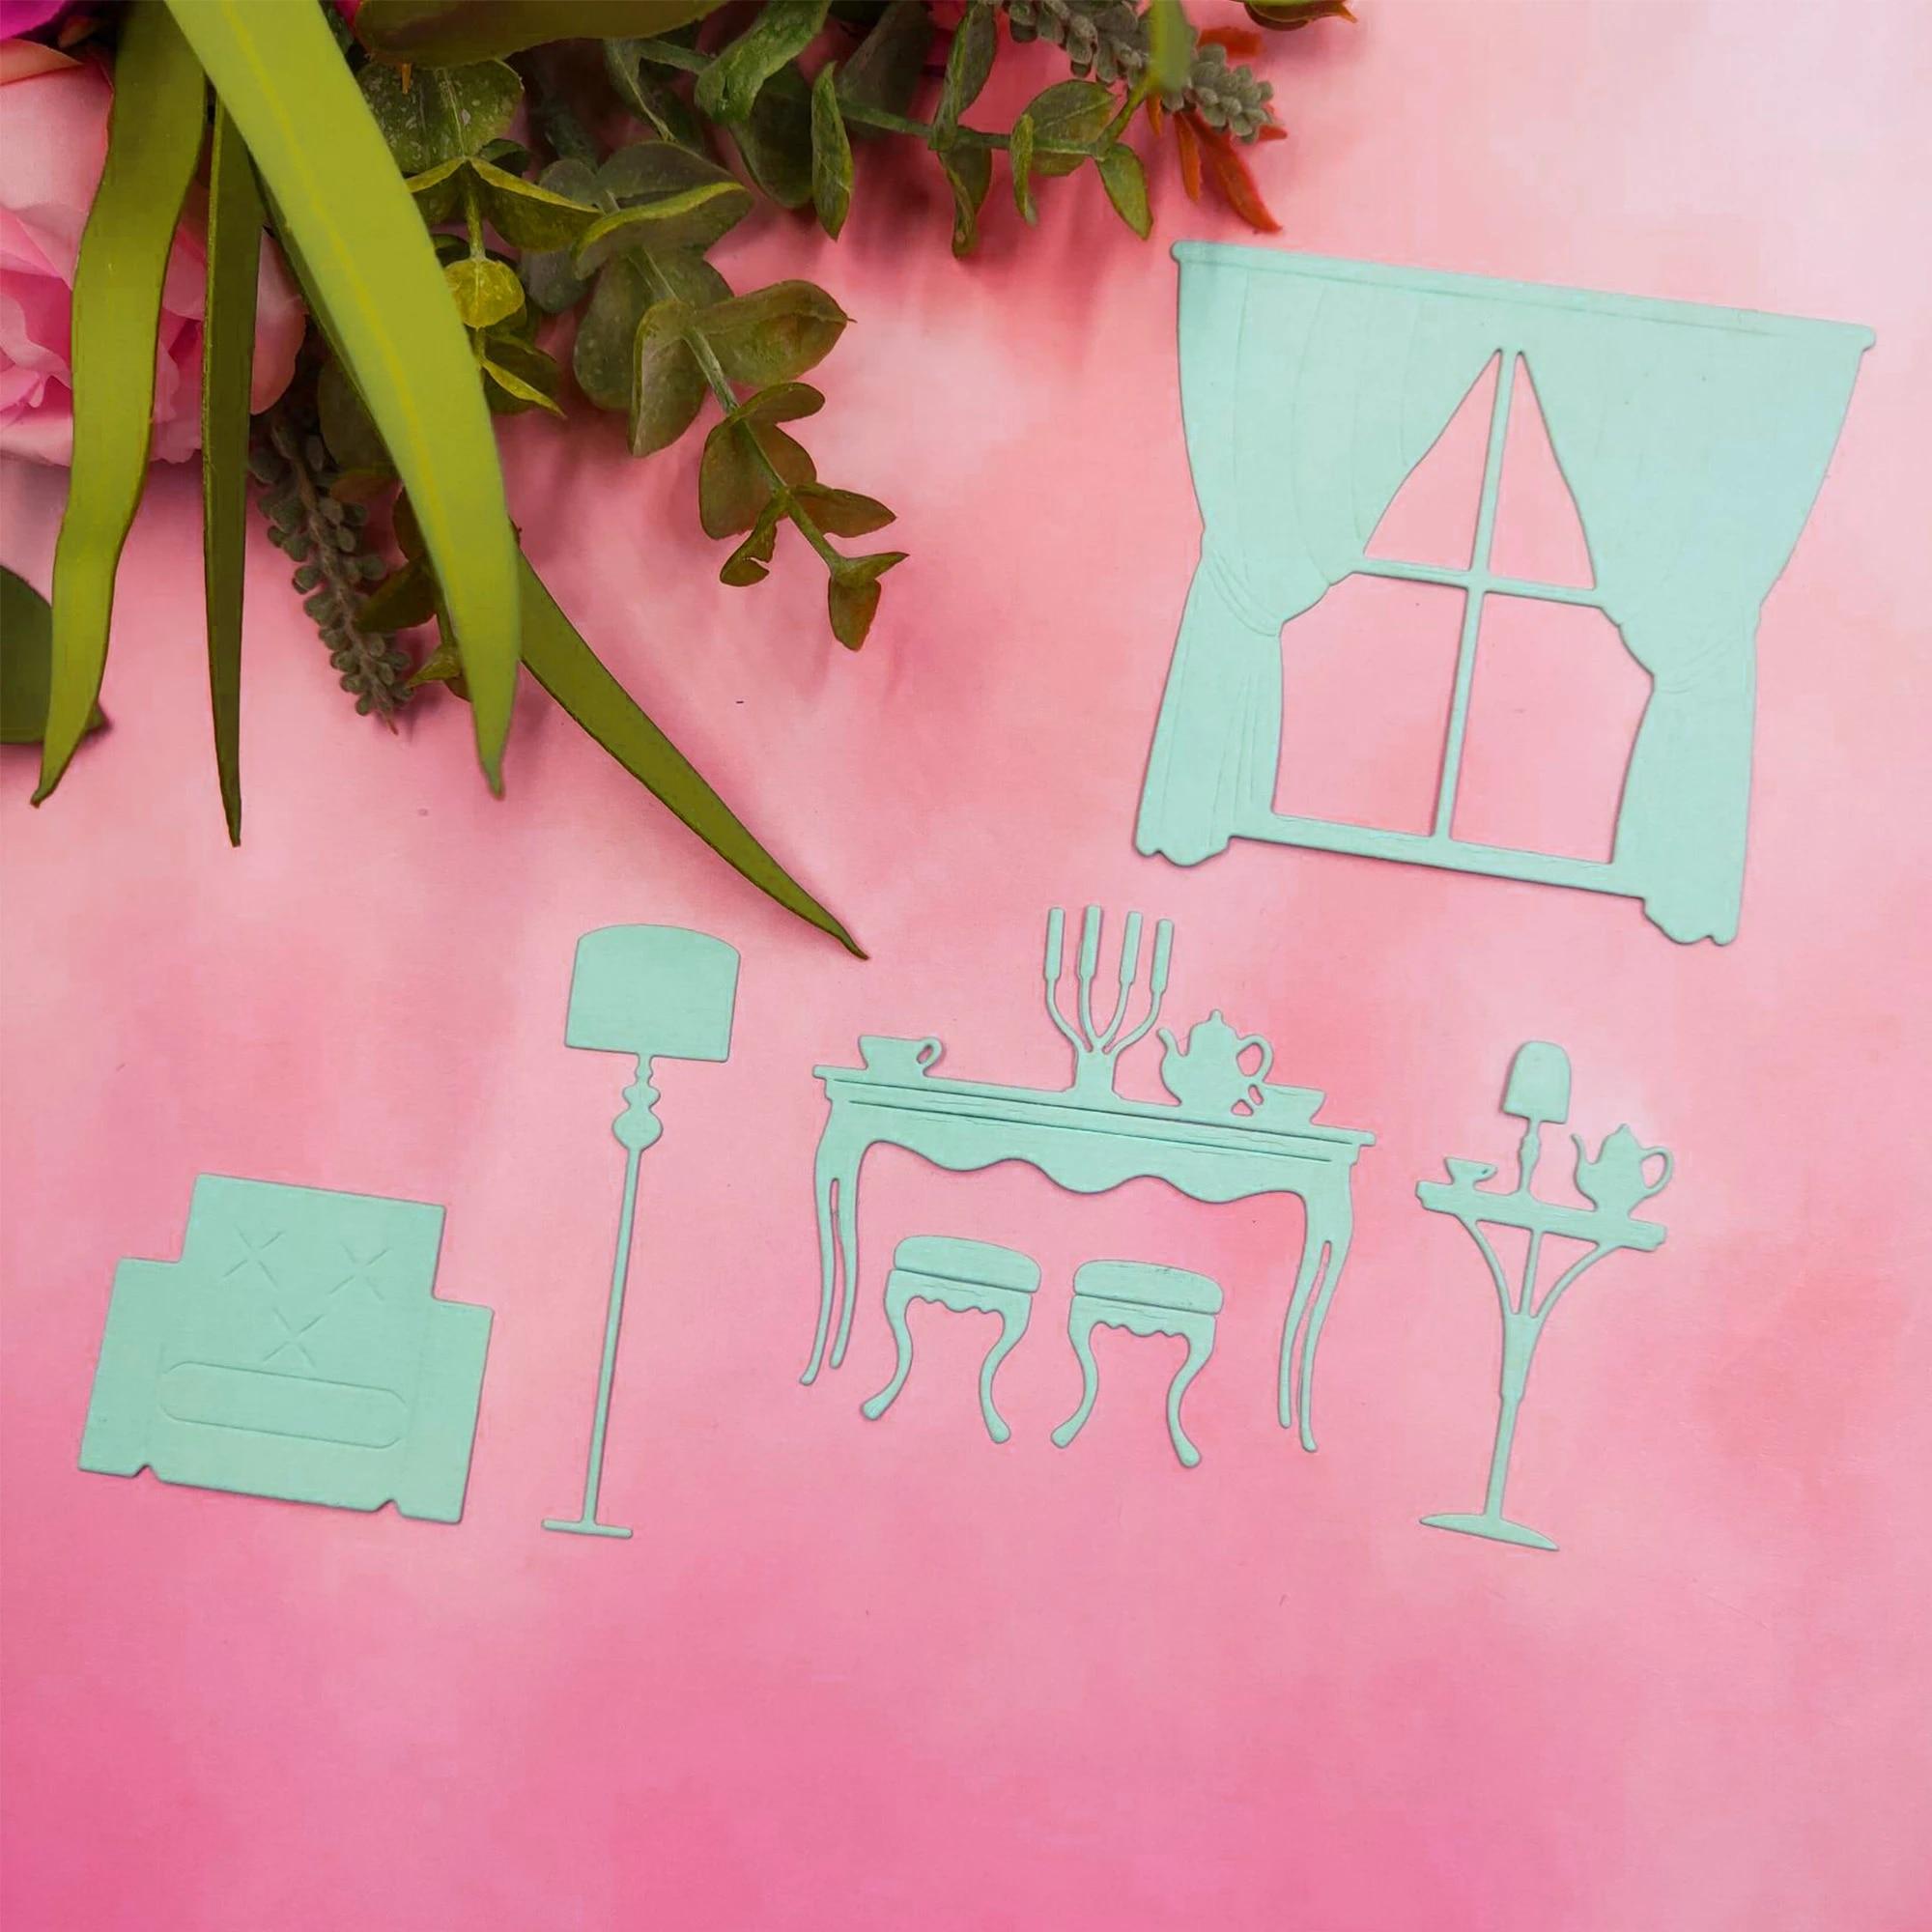 Stencils Scrapbooking Decorative Metal Embossing Paper Card Cutting Dies Curtain